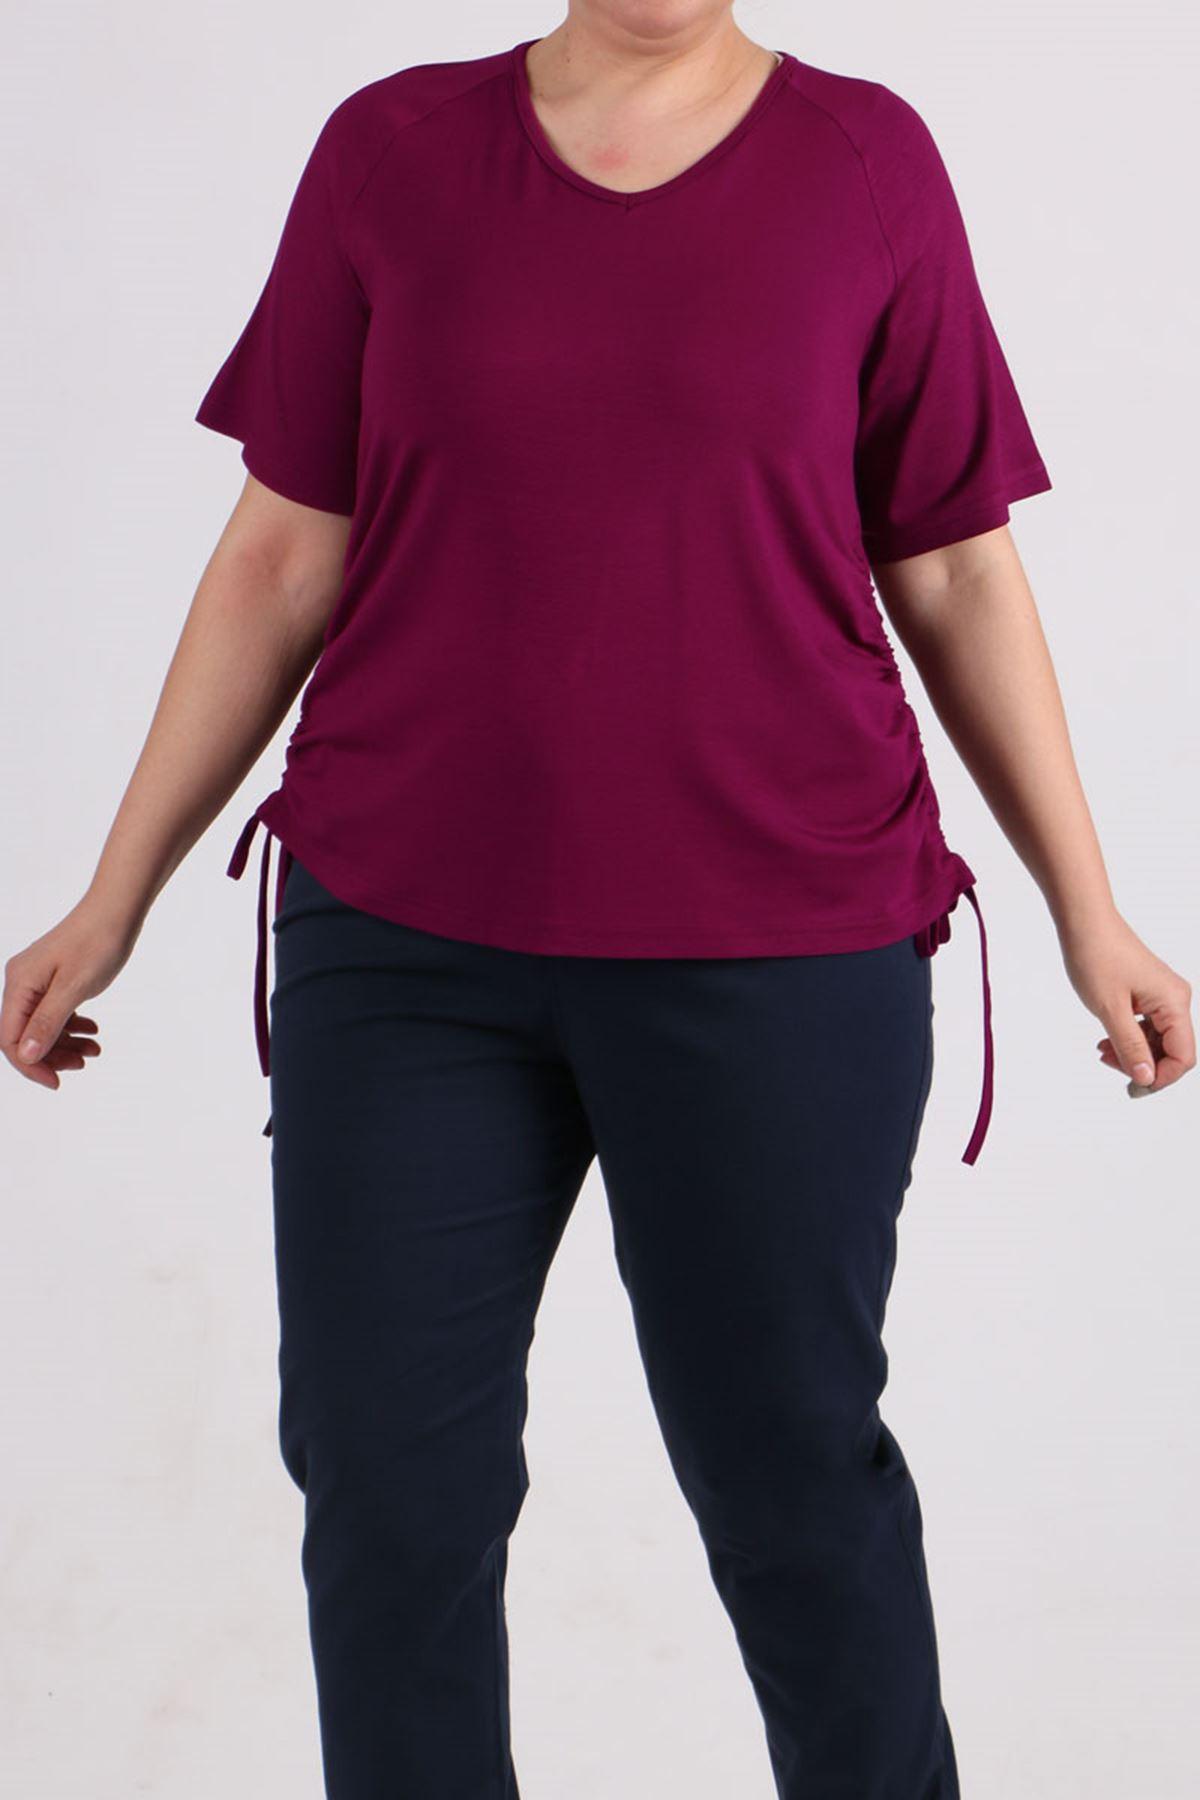 8530 Plus Size Raglan Sleeve T-Shirt - Plum